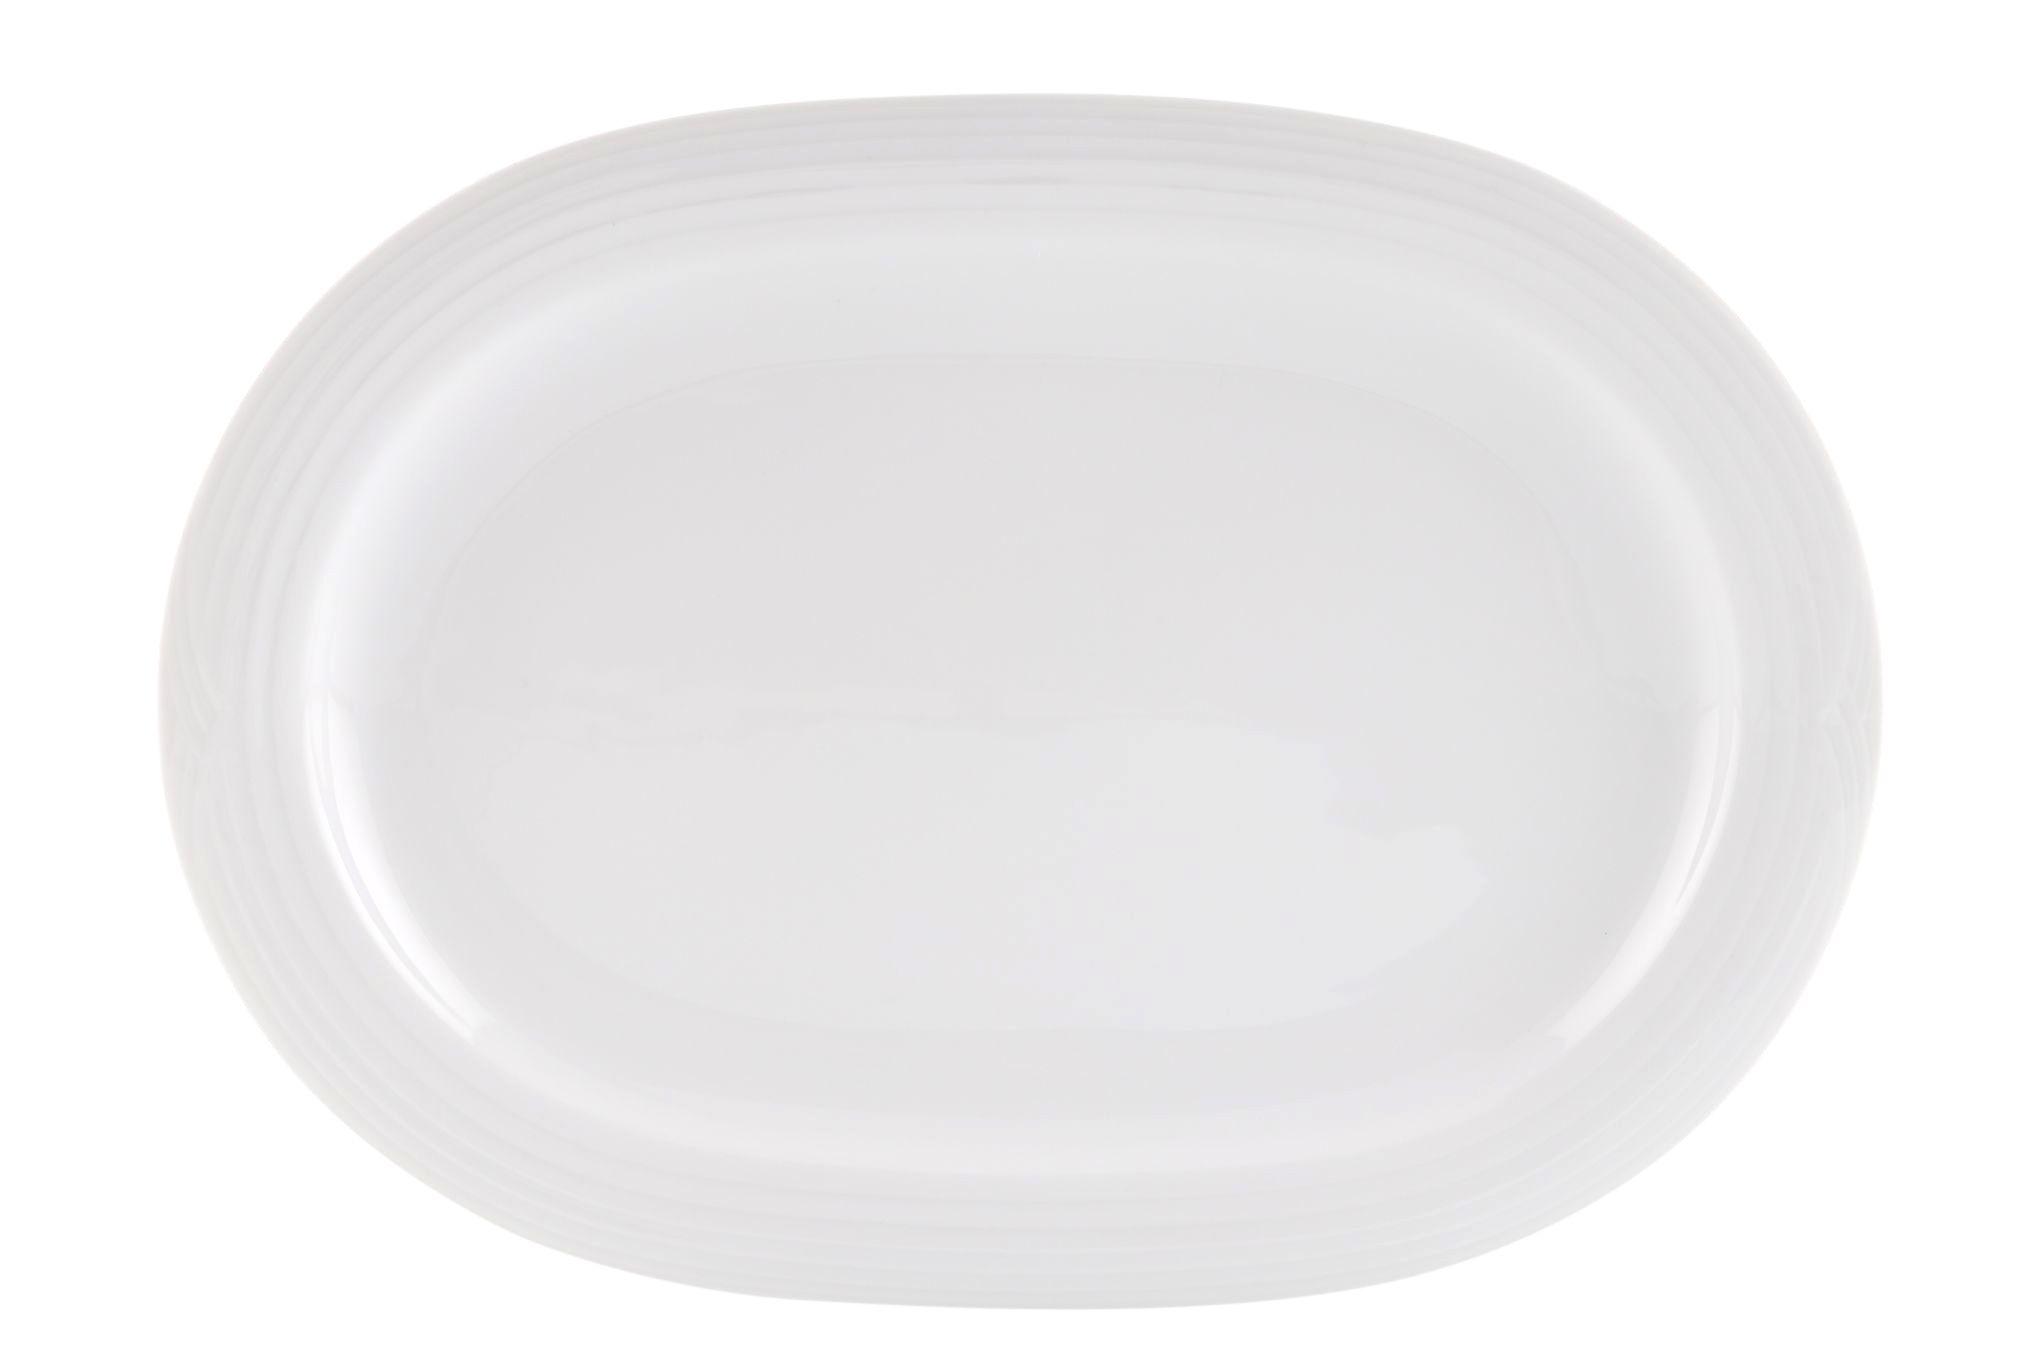 Noritake Arctic White Oval Plate / Platter 35.6cm thumb 1